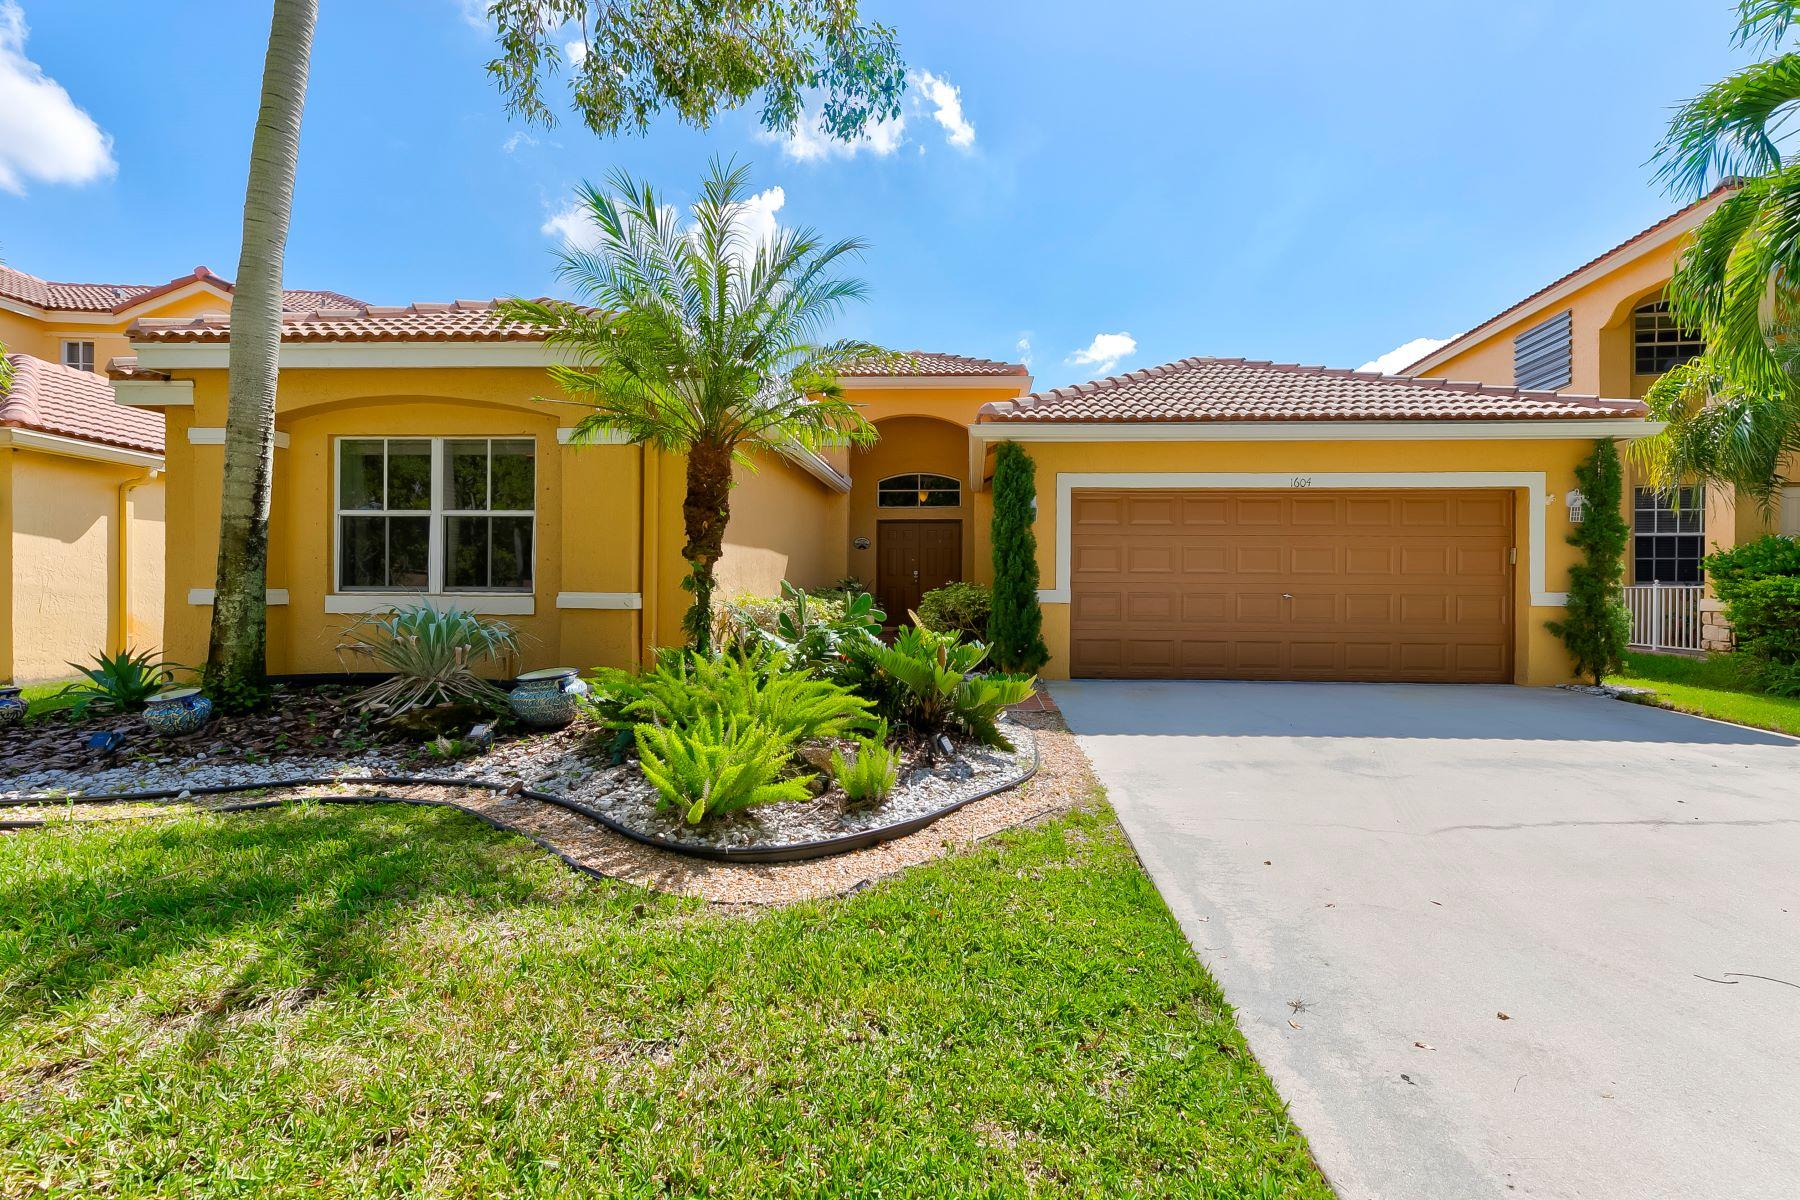 Single Family Homes for Sale at 1604 Sandpiper Circle Weston, Florida 33327 United States